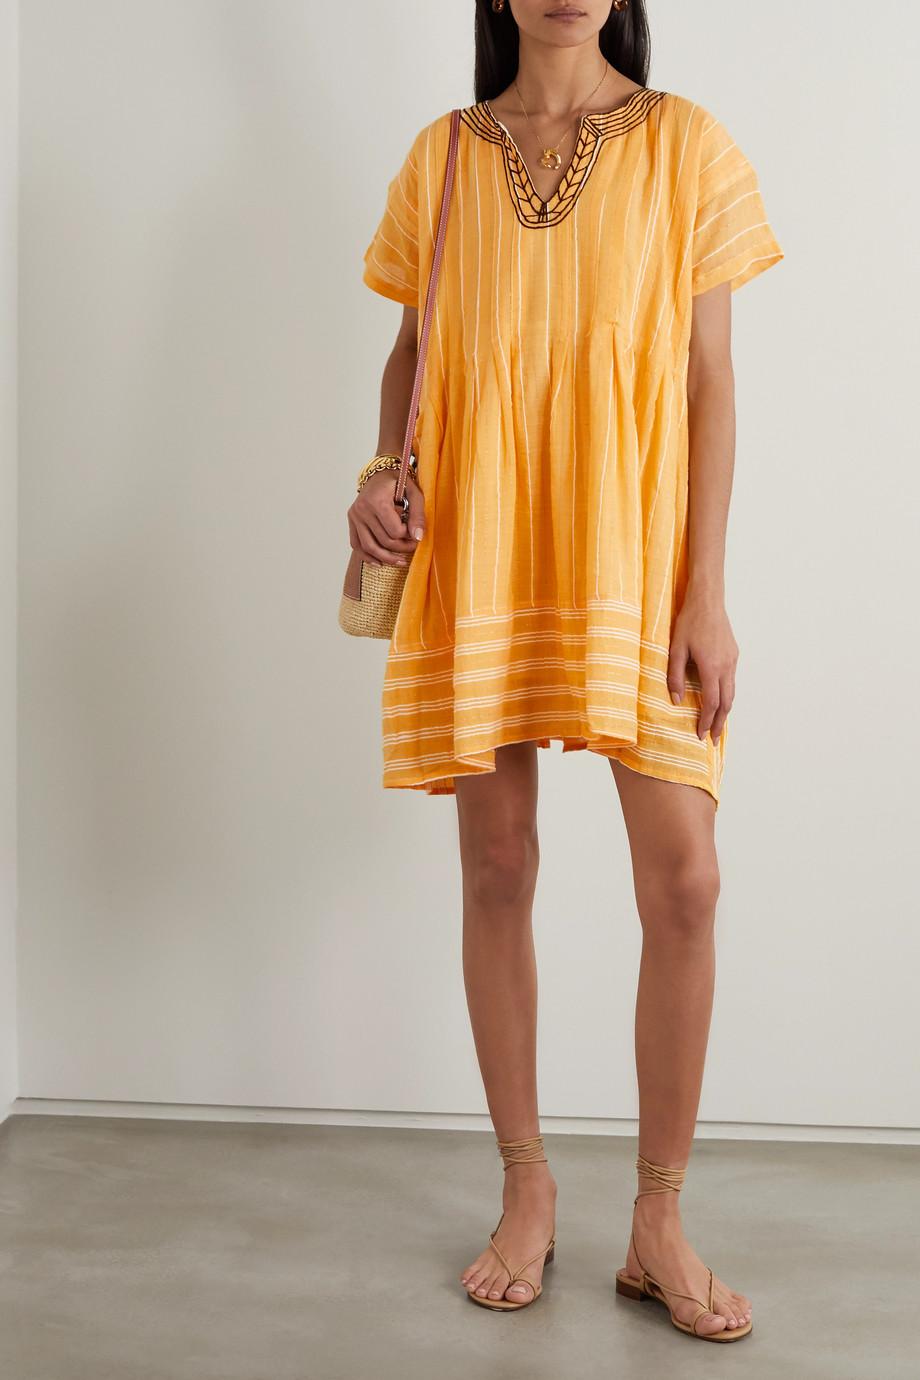 LemLem + NET SUSTAIN Wubet embroidered striped cotton-gauze mini dress